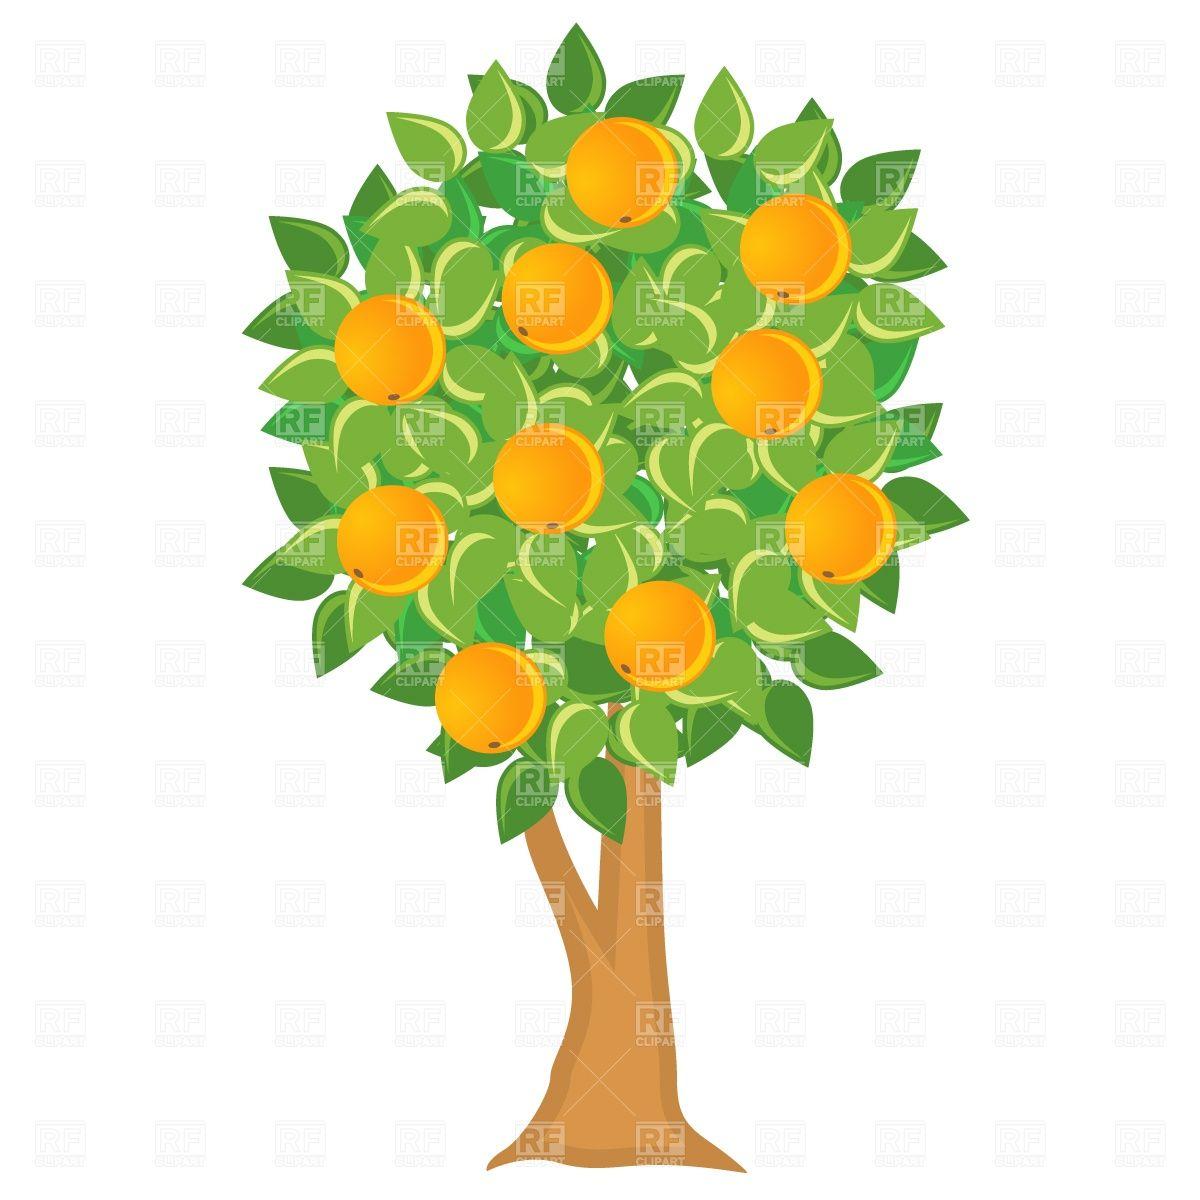 free vector clipart vector graphics art images pineapple beverages [ 1200 x 1200 Pixel ]